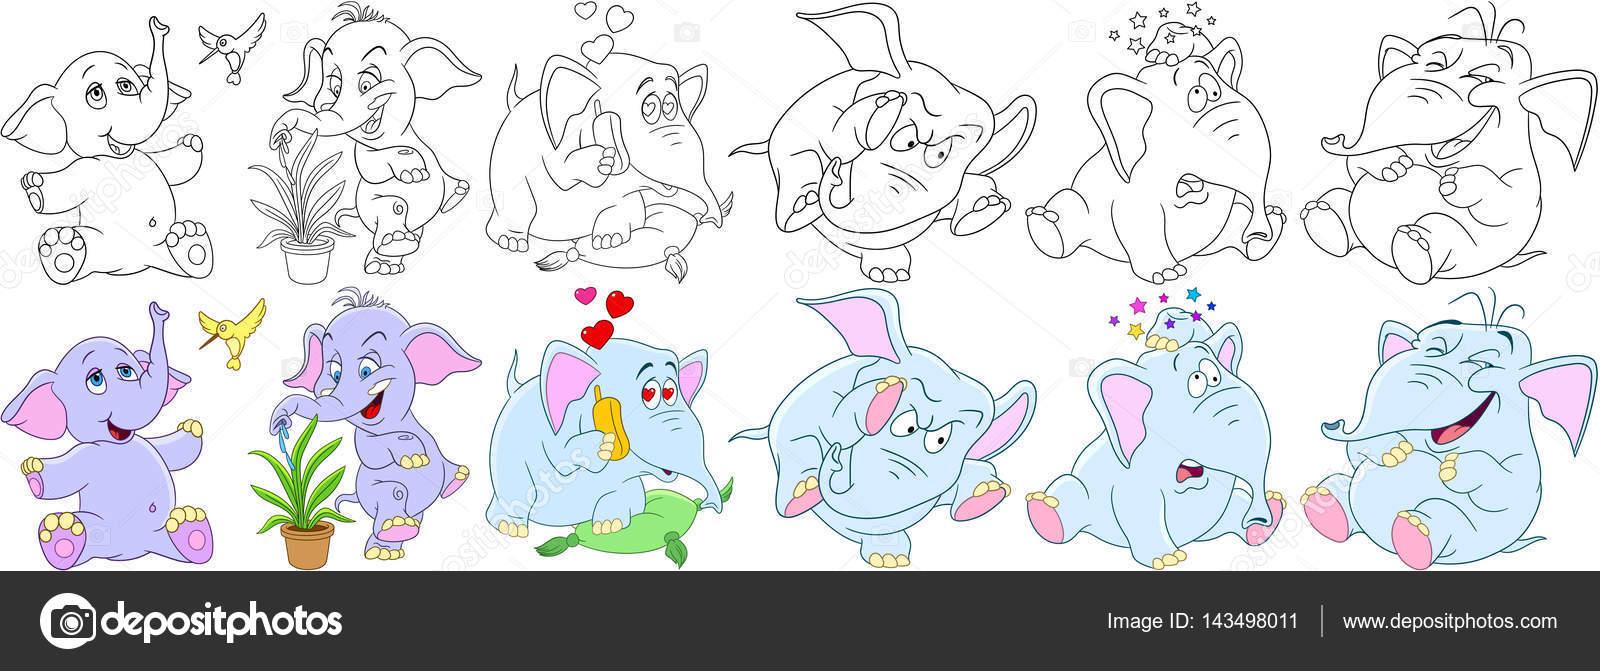 Cartoon-Elefanten-Satz — Stockvektor © Sybirko #143498011